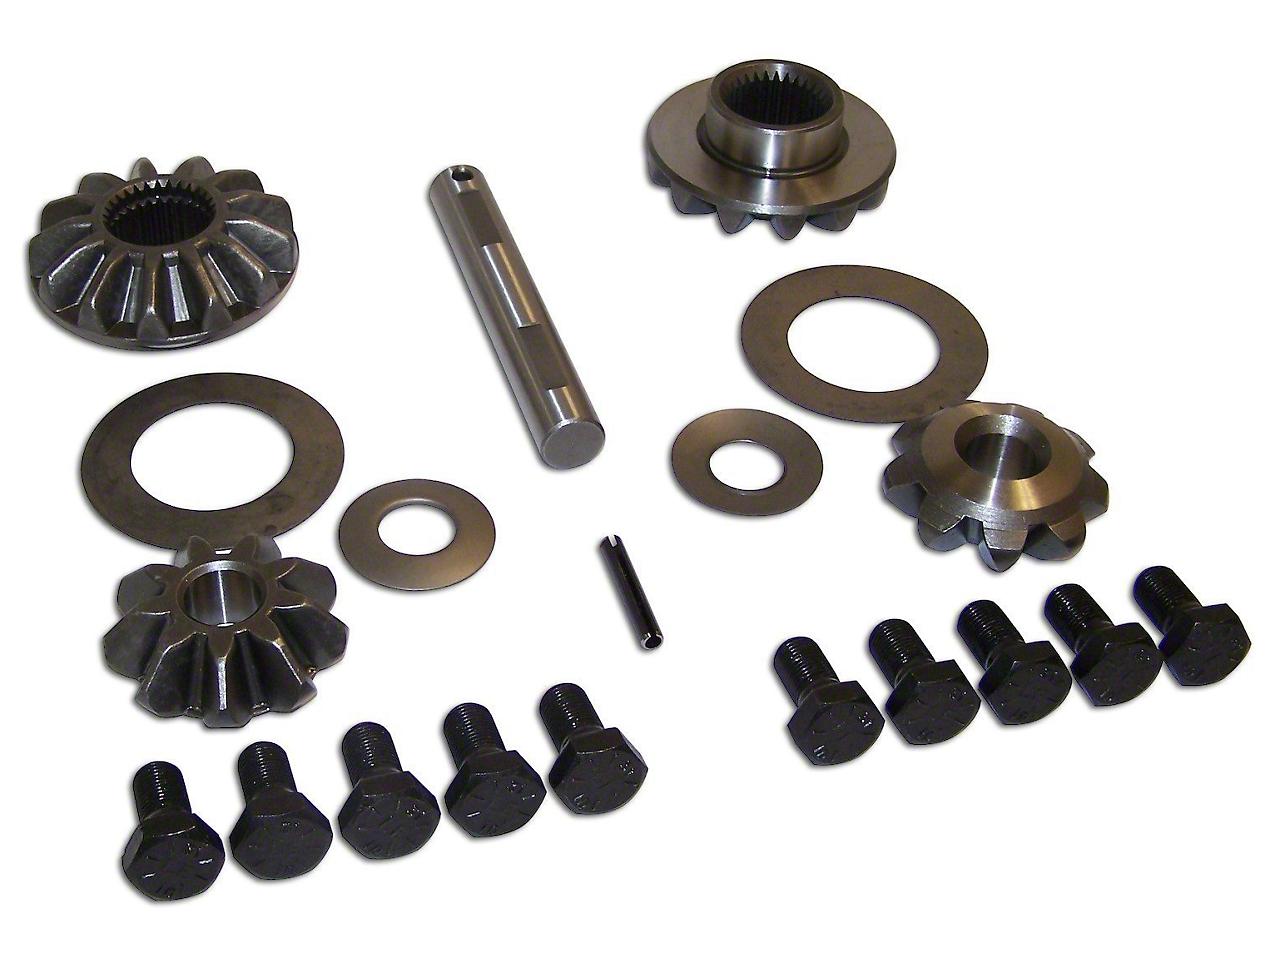 Omix-ADA Dana 44 Rear Axle Differential Gear Kit (07-18 Jeep Wrangler JK)